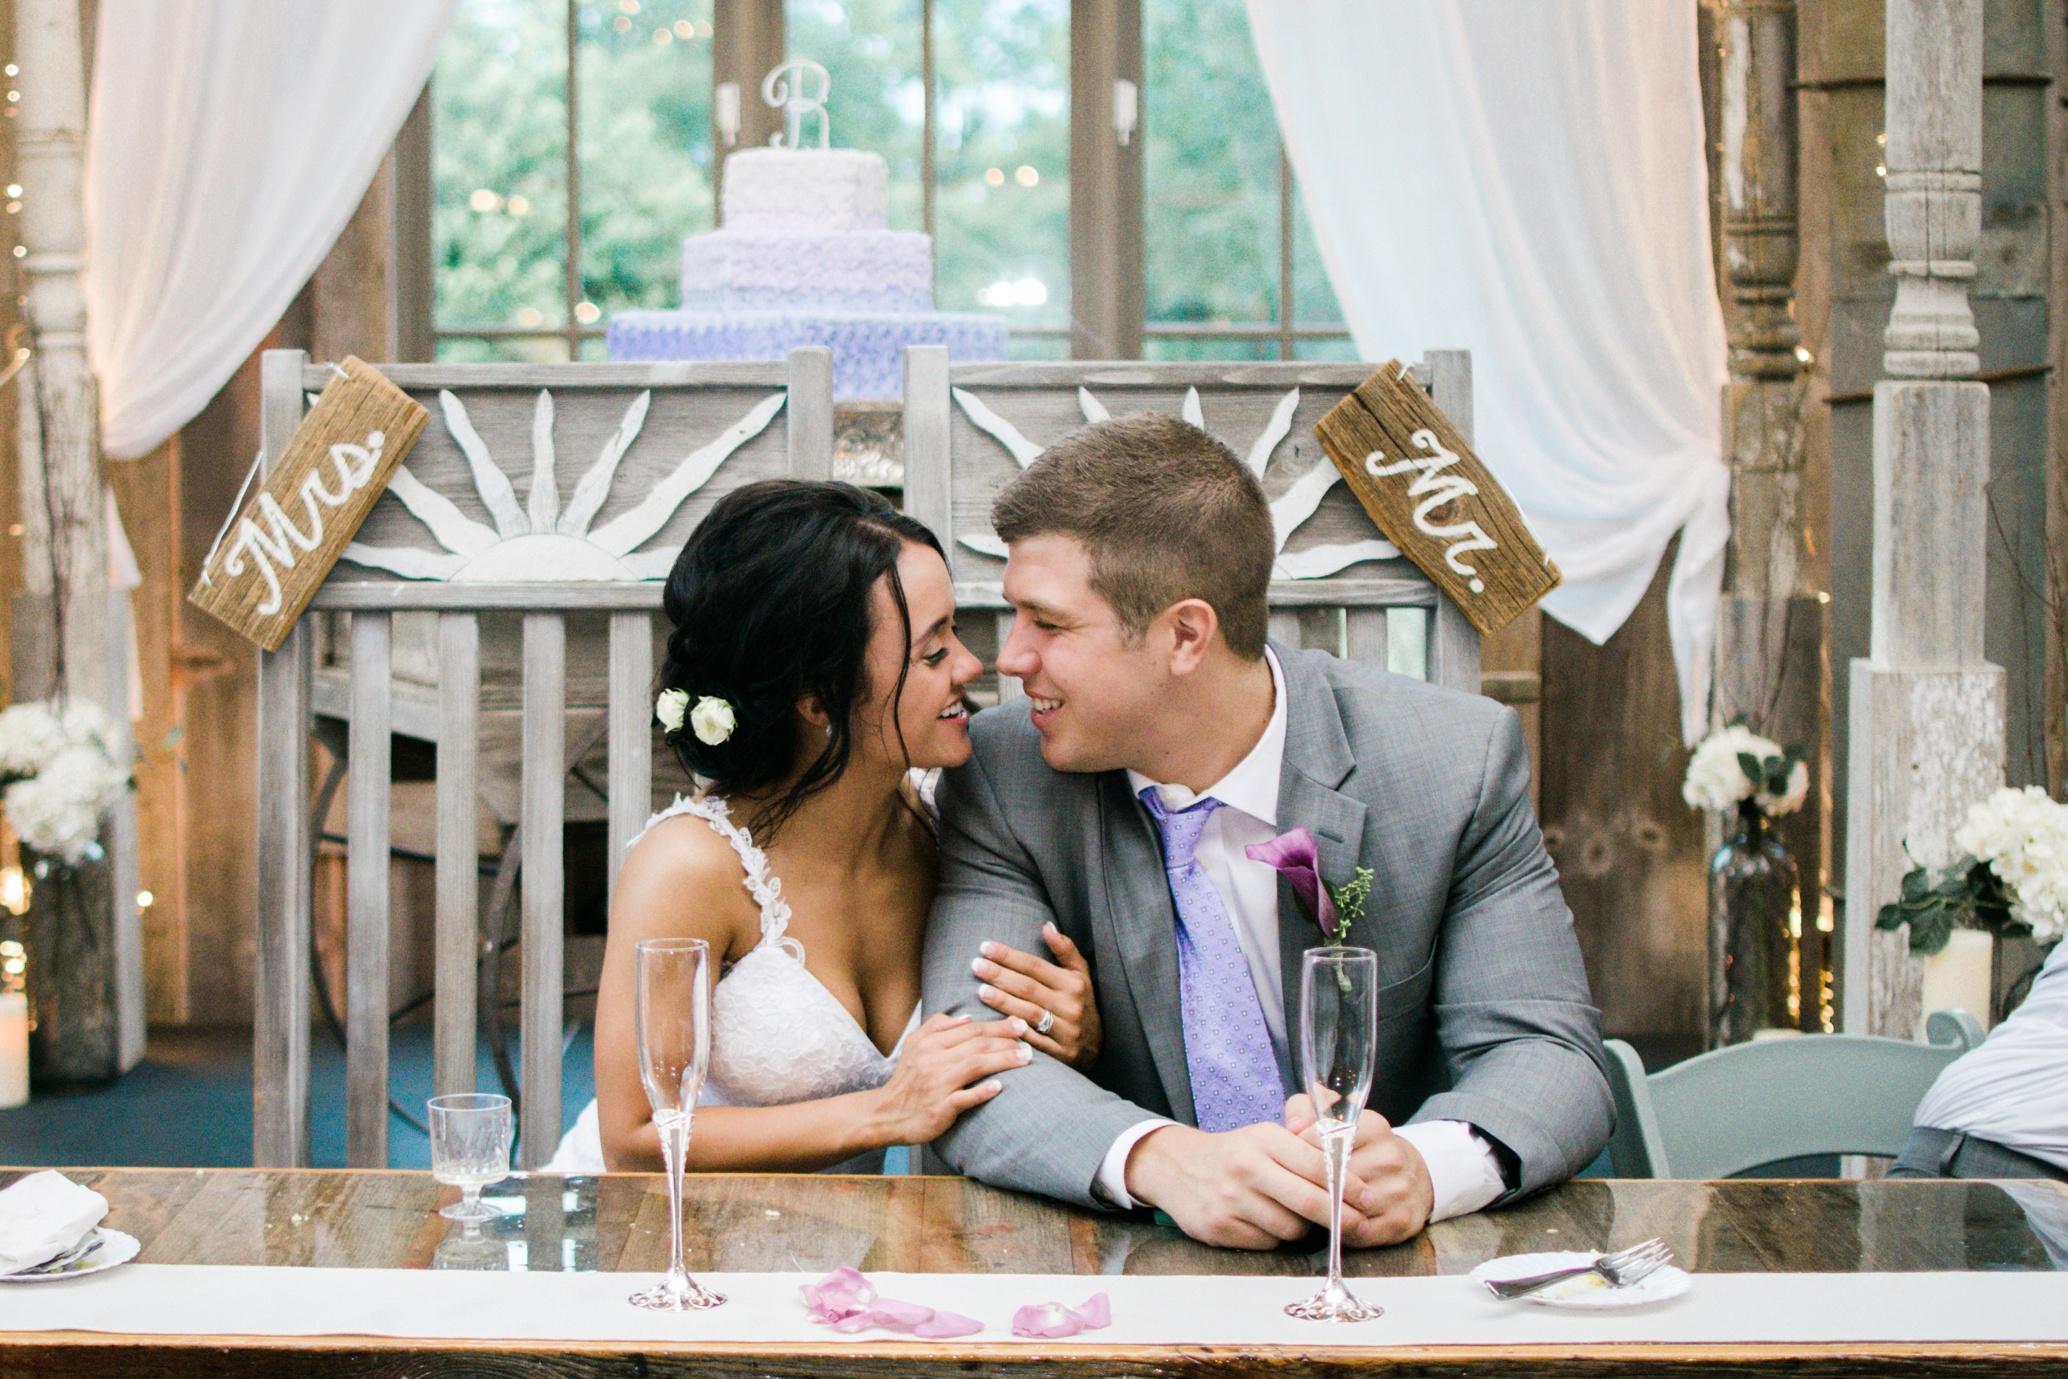 Barnes' Place Rustic Outdoor Wedding | Ali Leigh Photo Minneapolis Wedding Photographer_0167.jpg